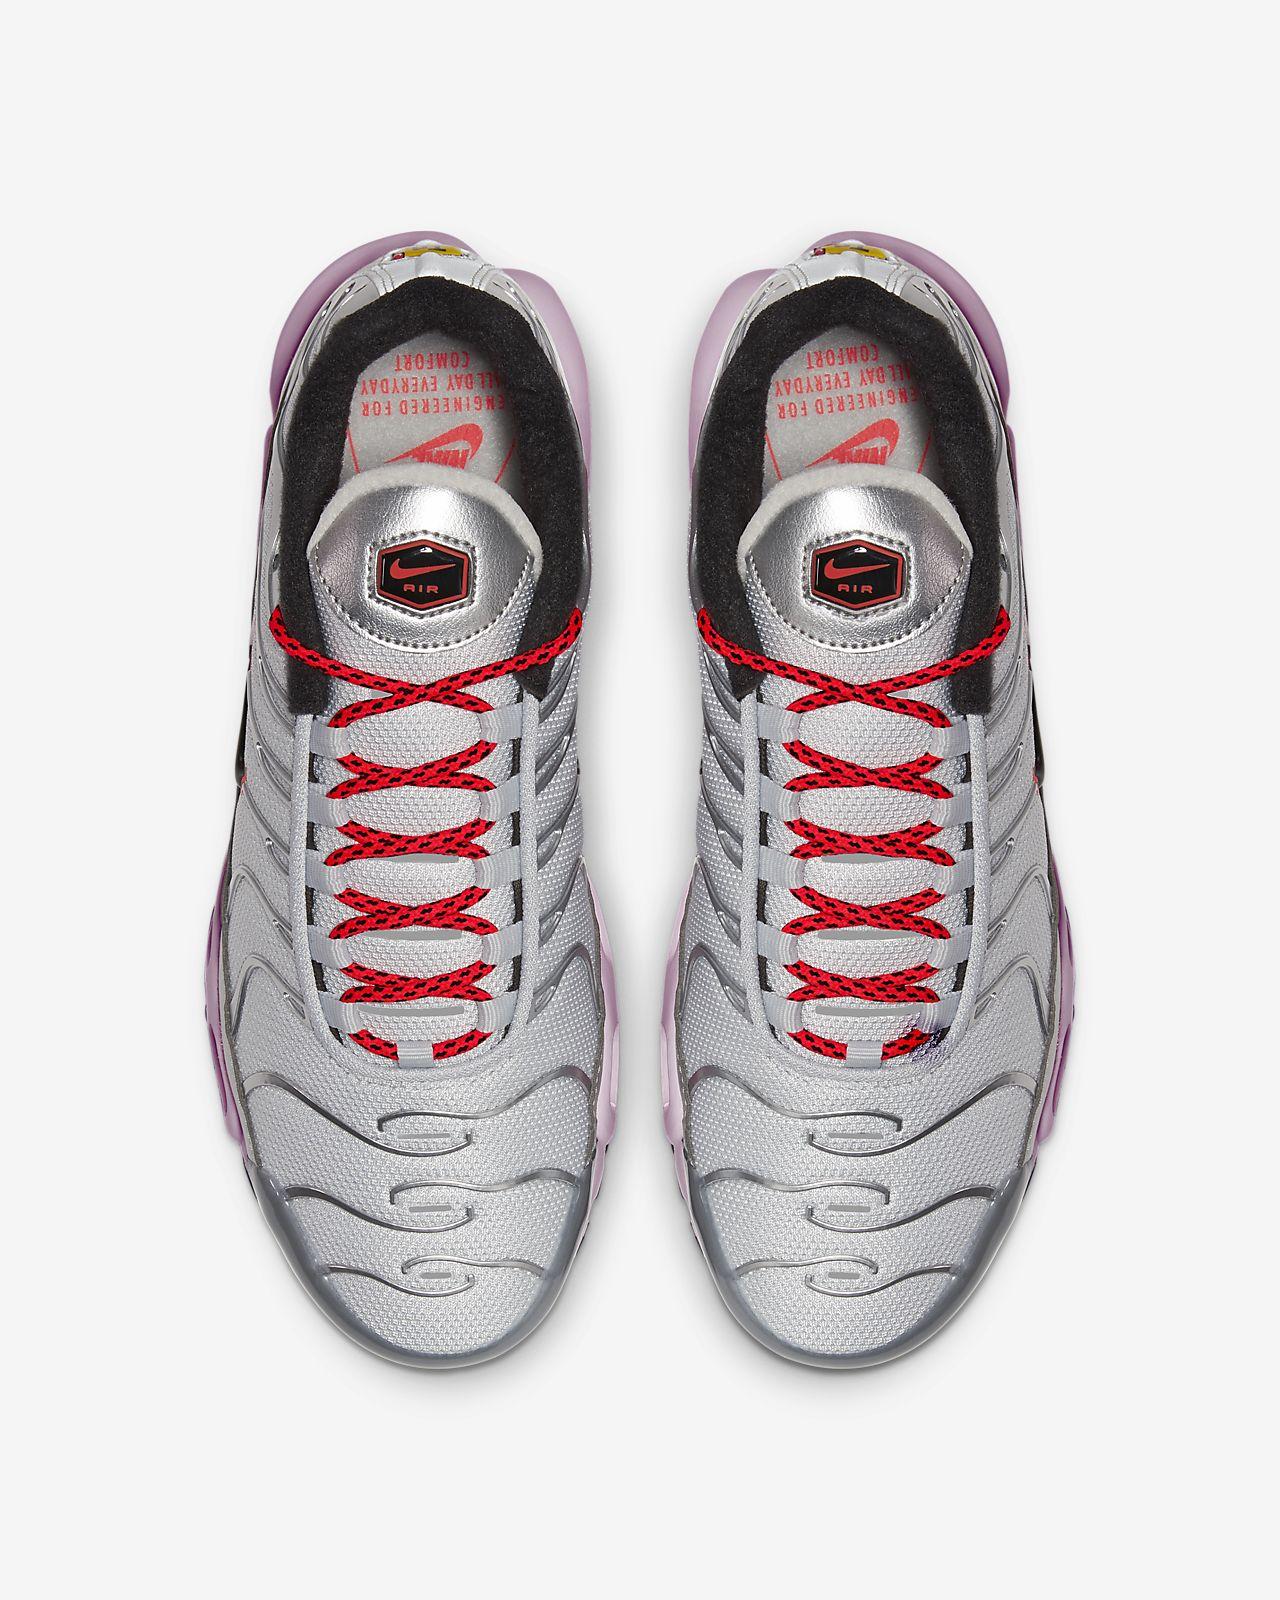 Nike Air Max Plus Premium Damesschoen. Nike NL